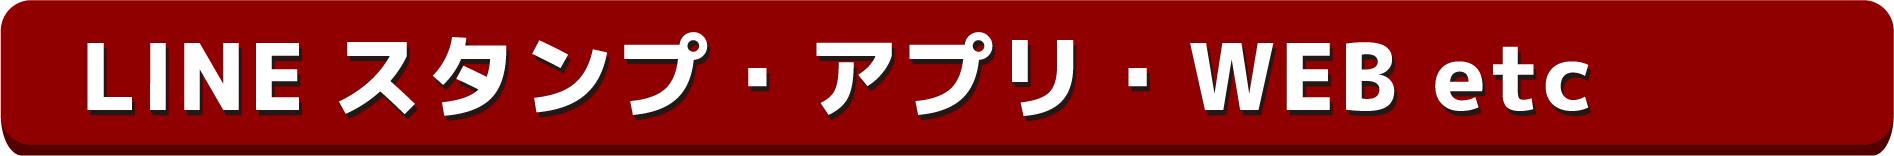 LINEスタンプ・アプリ・WEB etc